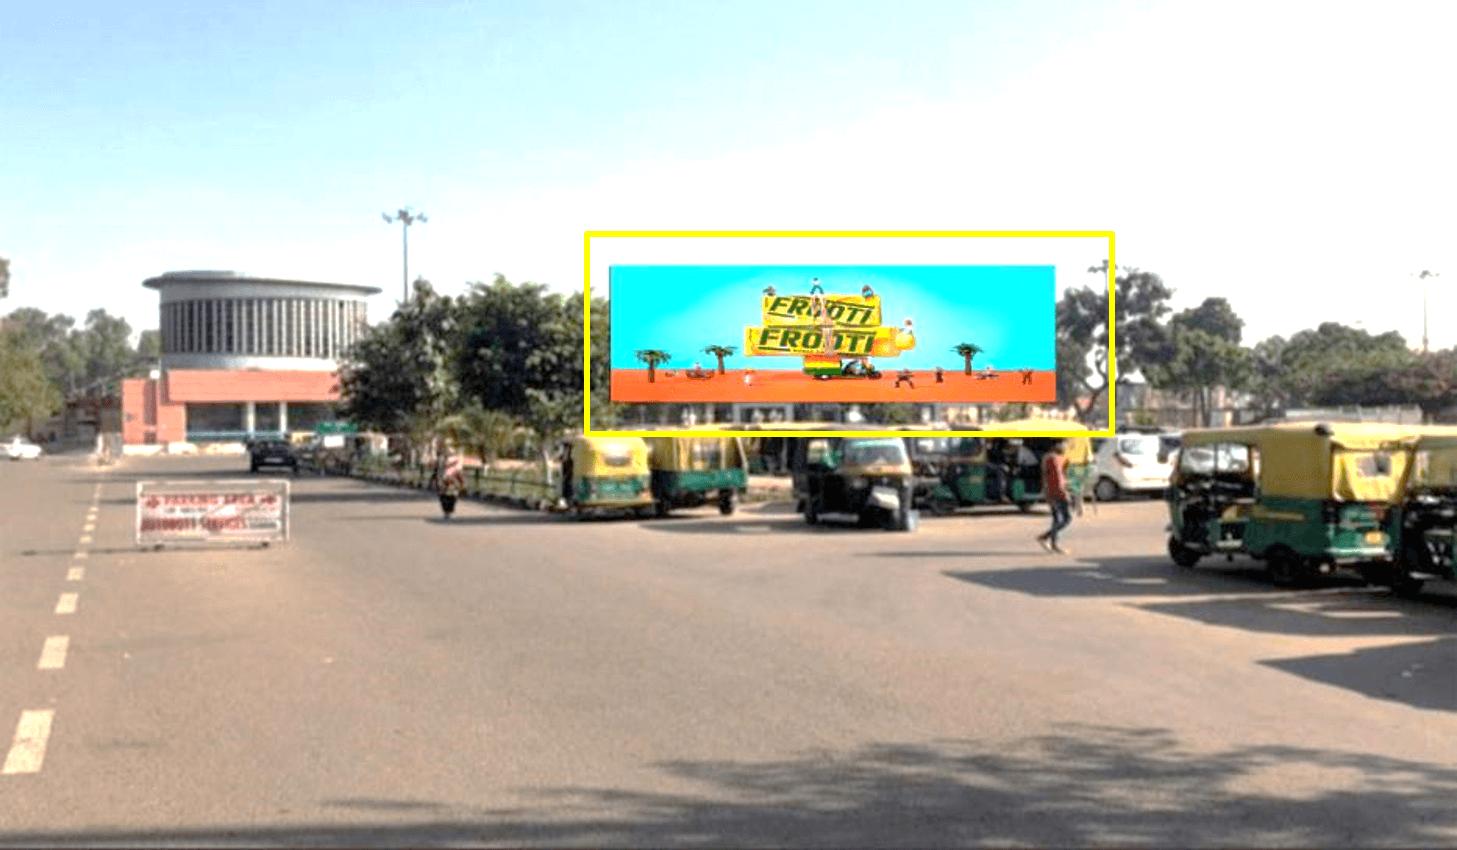 Option No.3 Unipole advertising at Railway Station, Parking Turn, Chandigarh